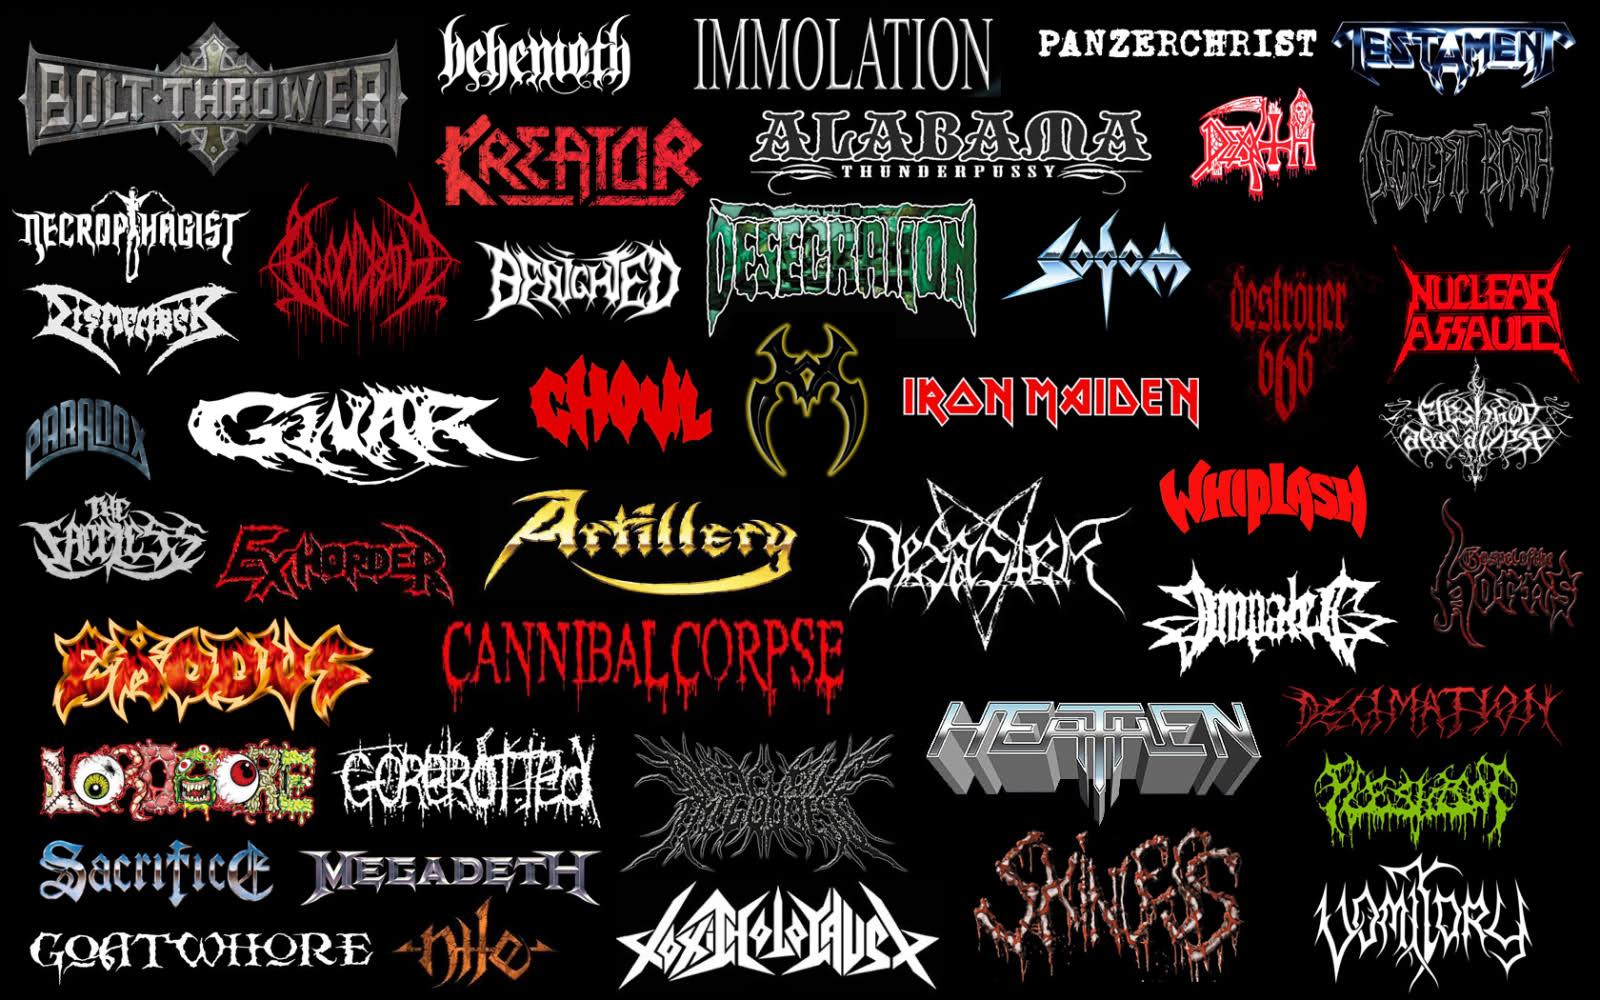 Free Download Hd Wallpaper Black Metal Favourite Bands Be